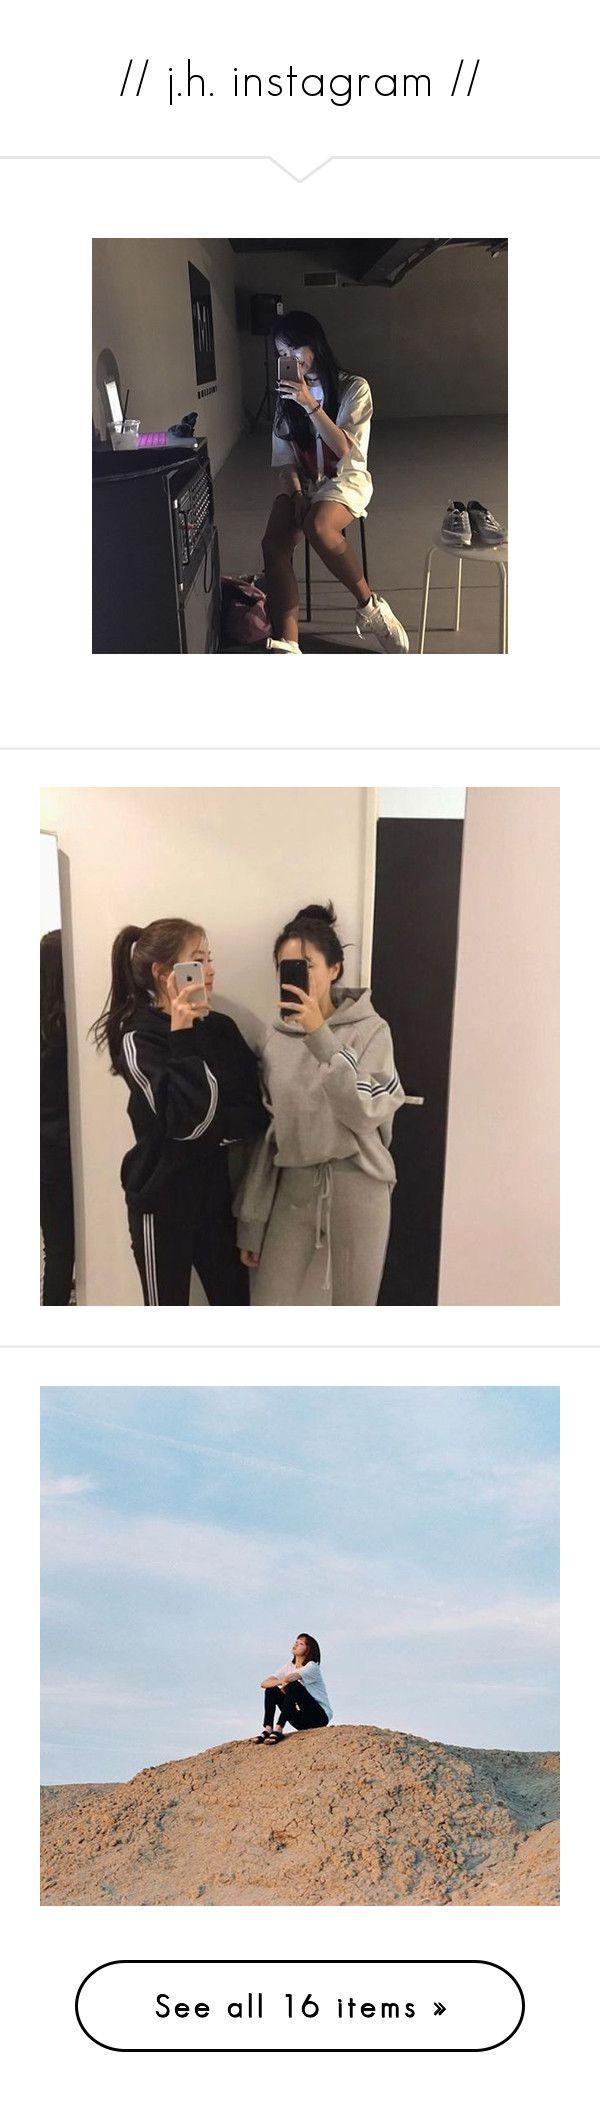 """// j.h. instagram //"" by goner-aesthetics ❤ liked on Polyvore featuring people, food, instagram, pants, leggings, women, nylon leggings, nylon pants, beige leggings and elastic band pants"